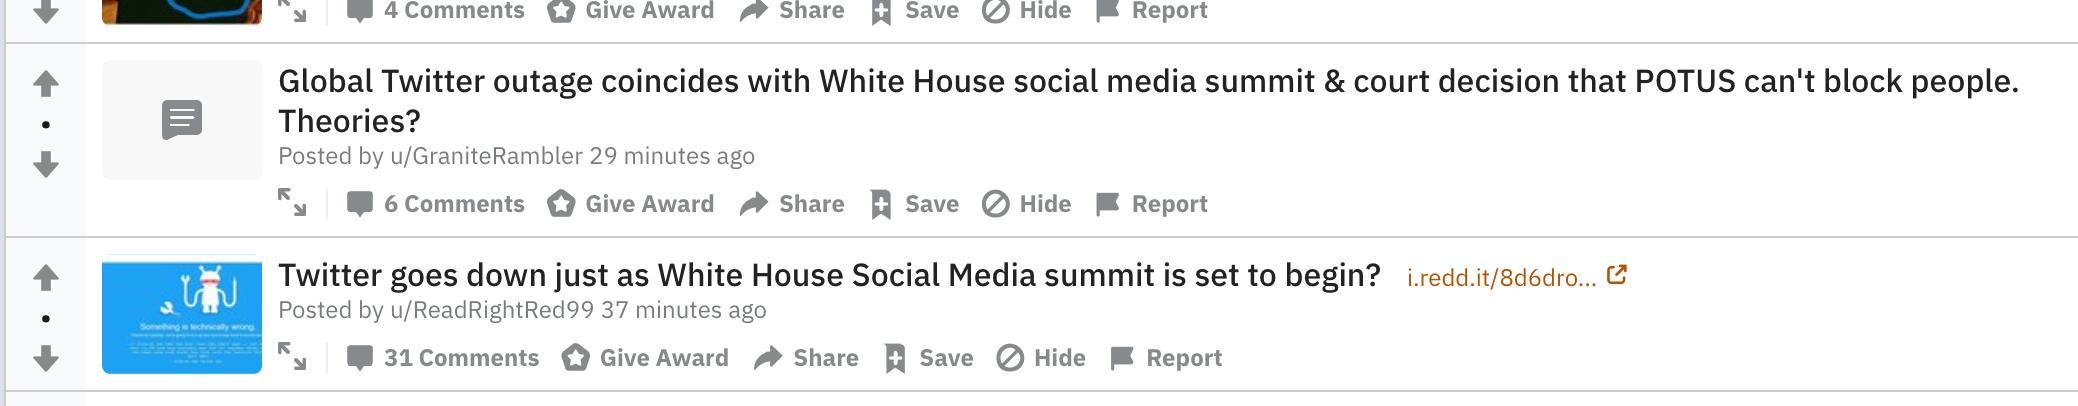 reddit conspiracy twitter down